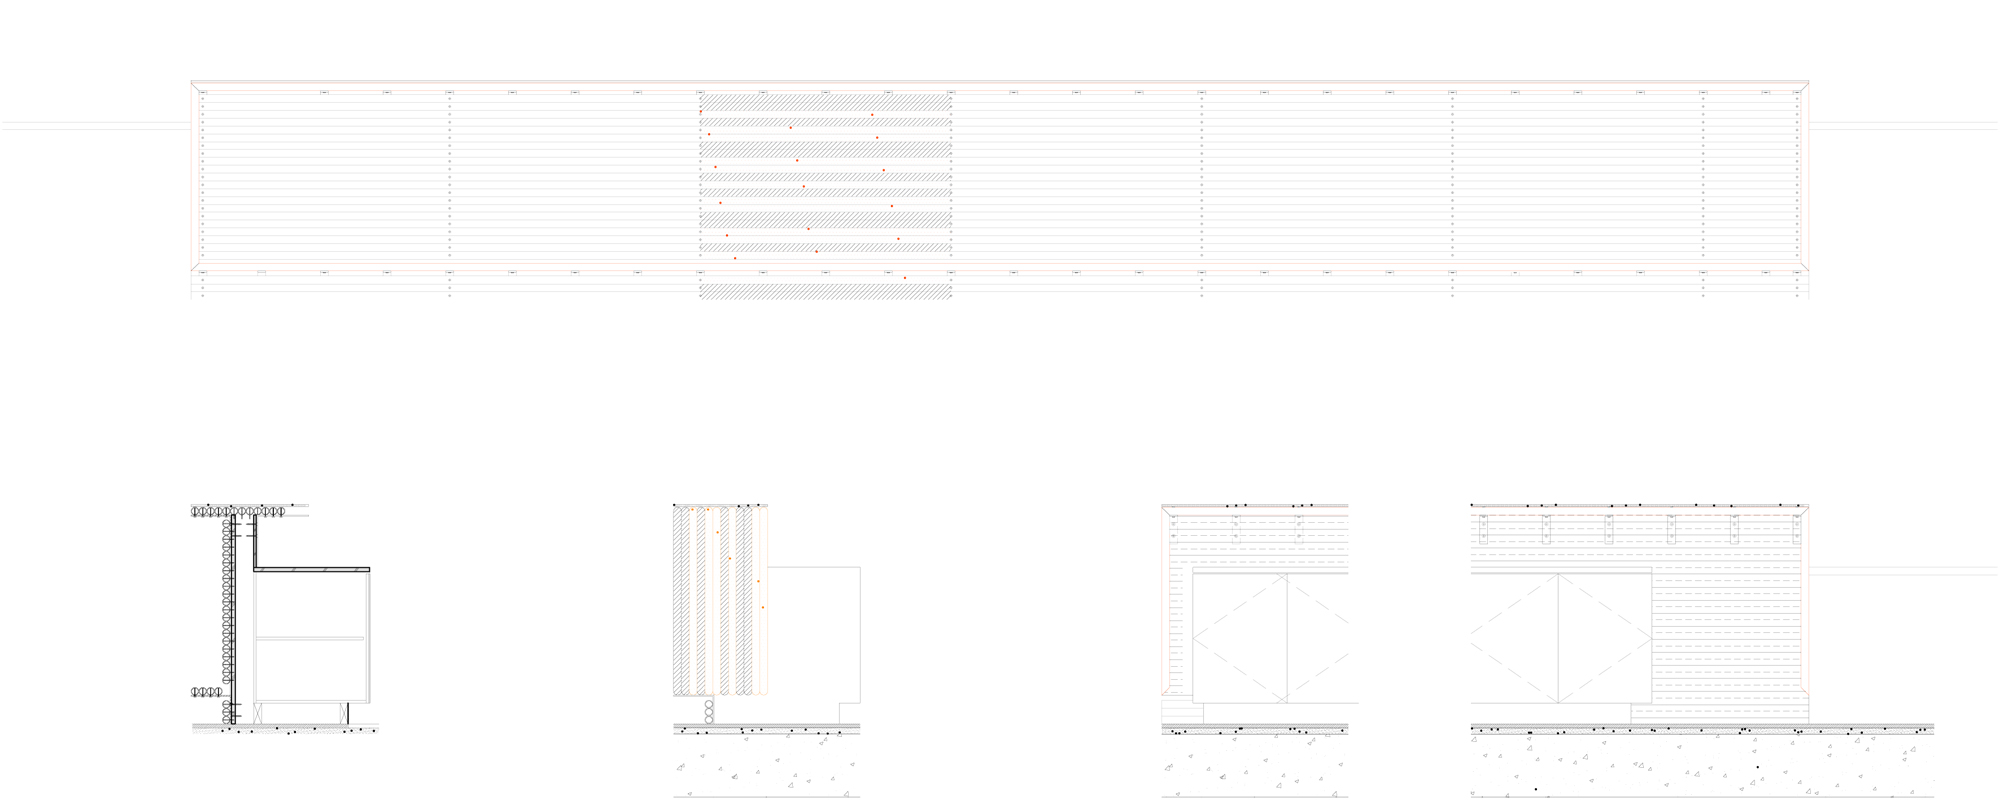 S:ProjectsValenciadwgbaseinteriorval-bar-kitchen.dwg Model